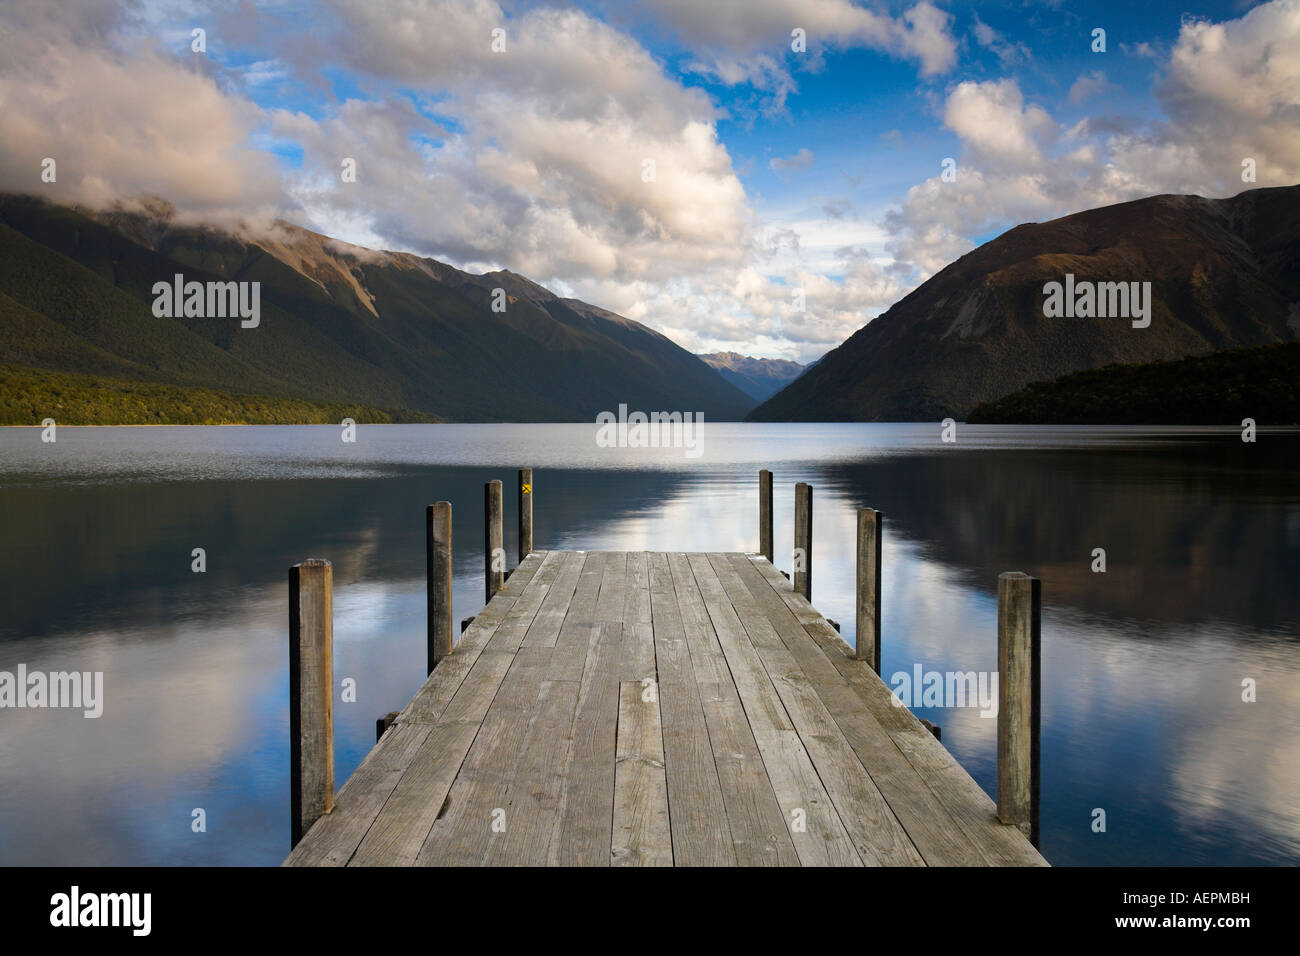 Lake Rotoiti in the Nelson Lakes National Park, New Zealand - Stock Image